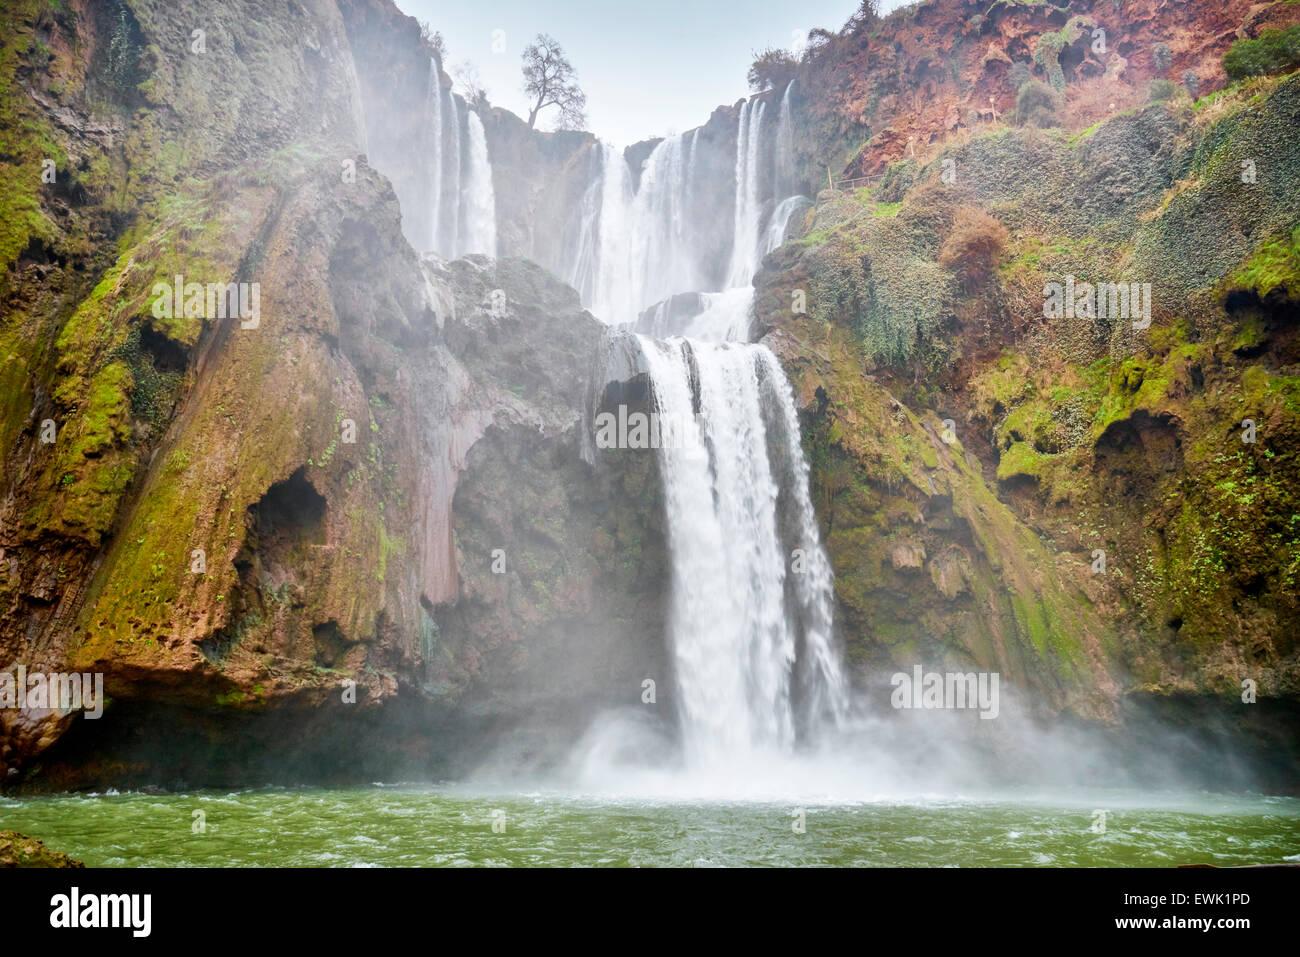 Ouzoud Waterfalls, Beni Mellal, Morocco, Africa - Stock Image